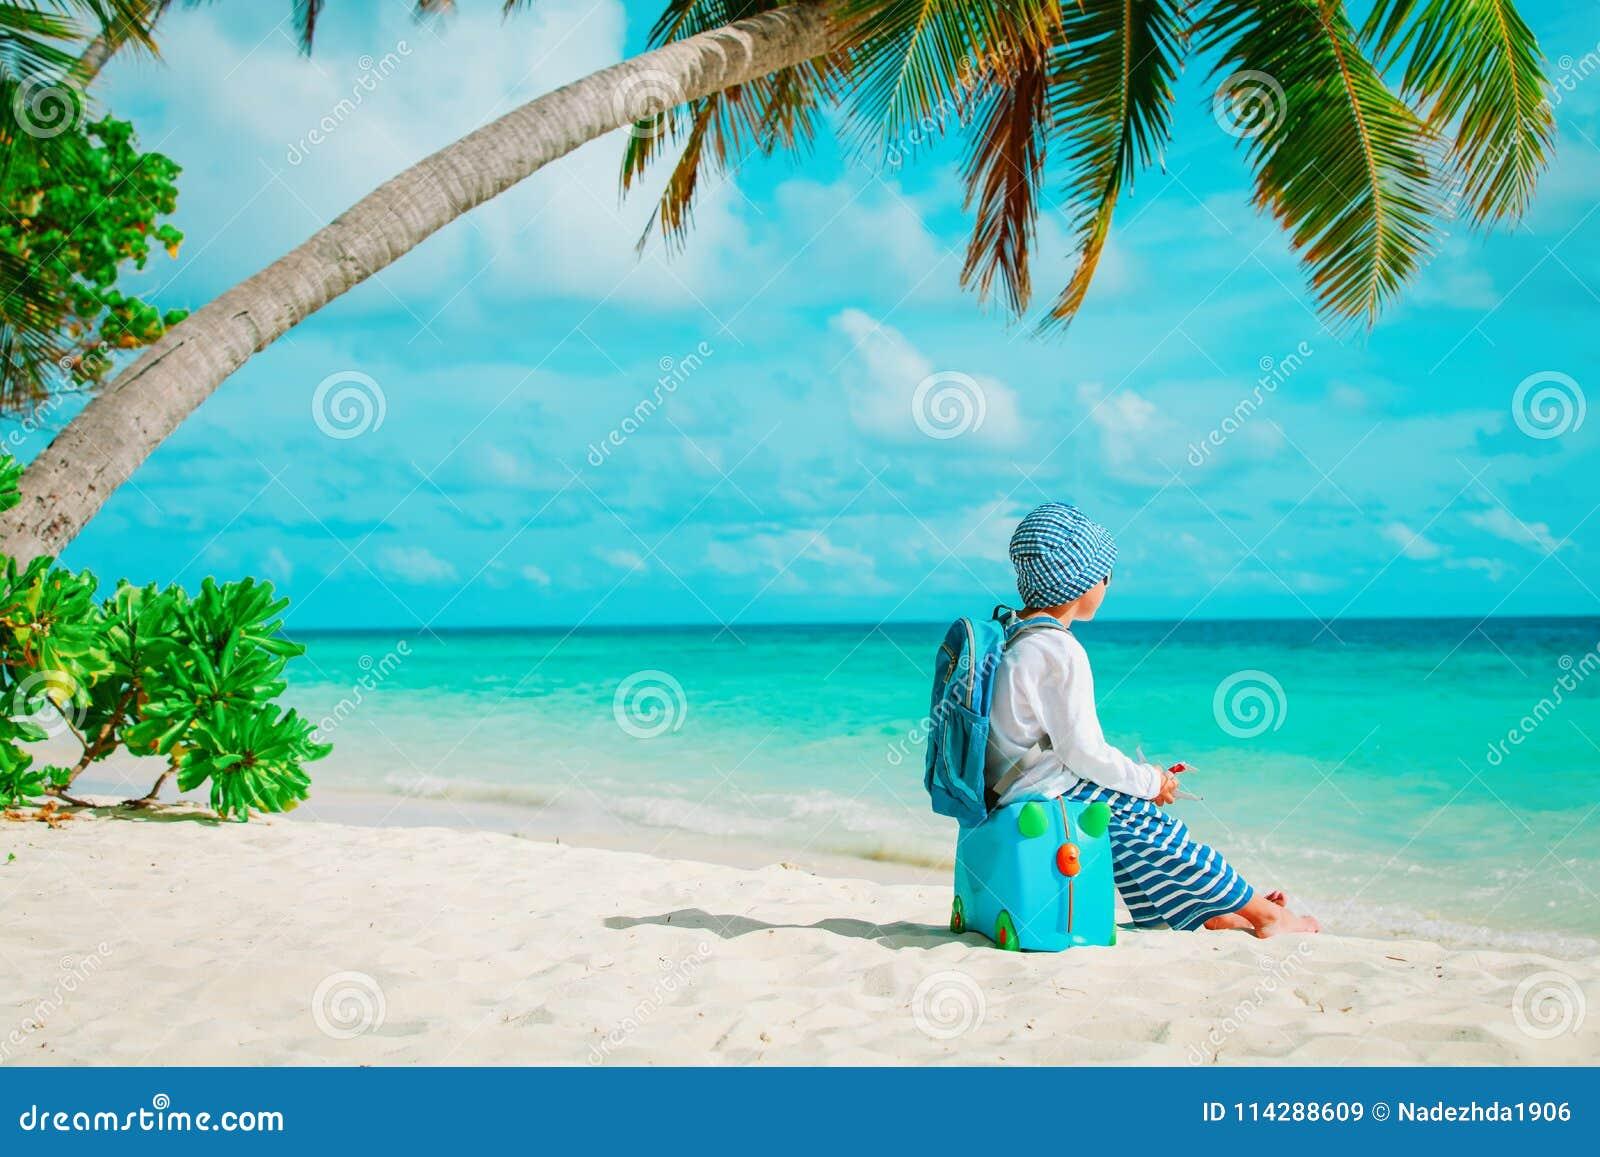 Little boy travel on tropical beach